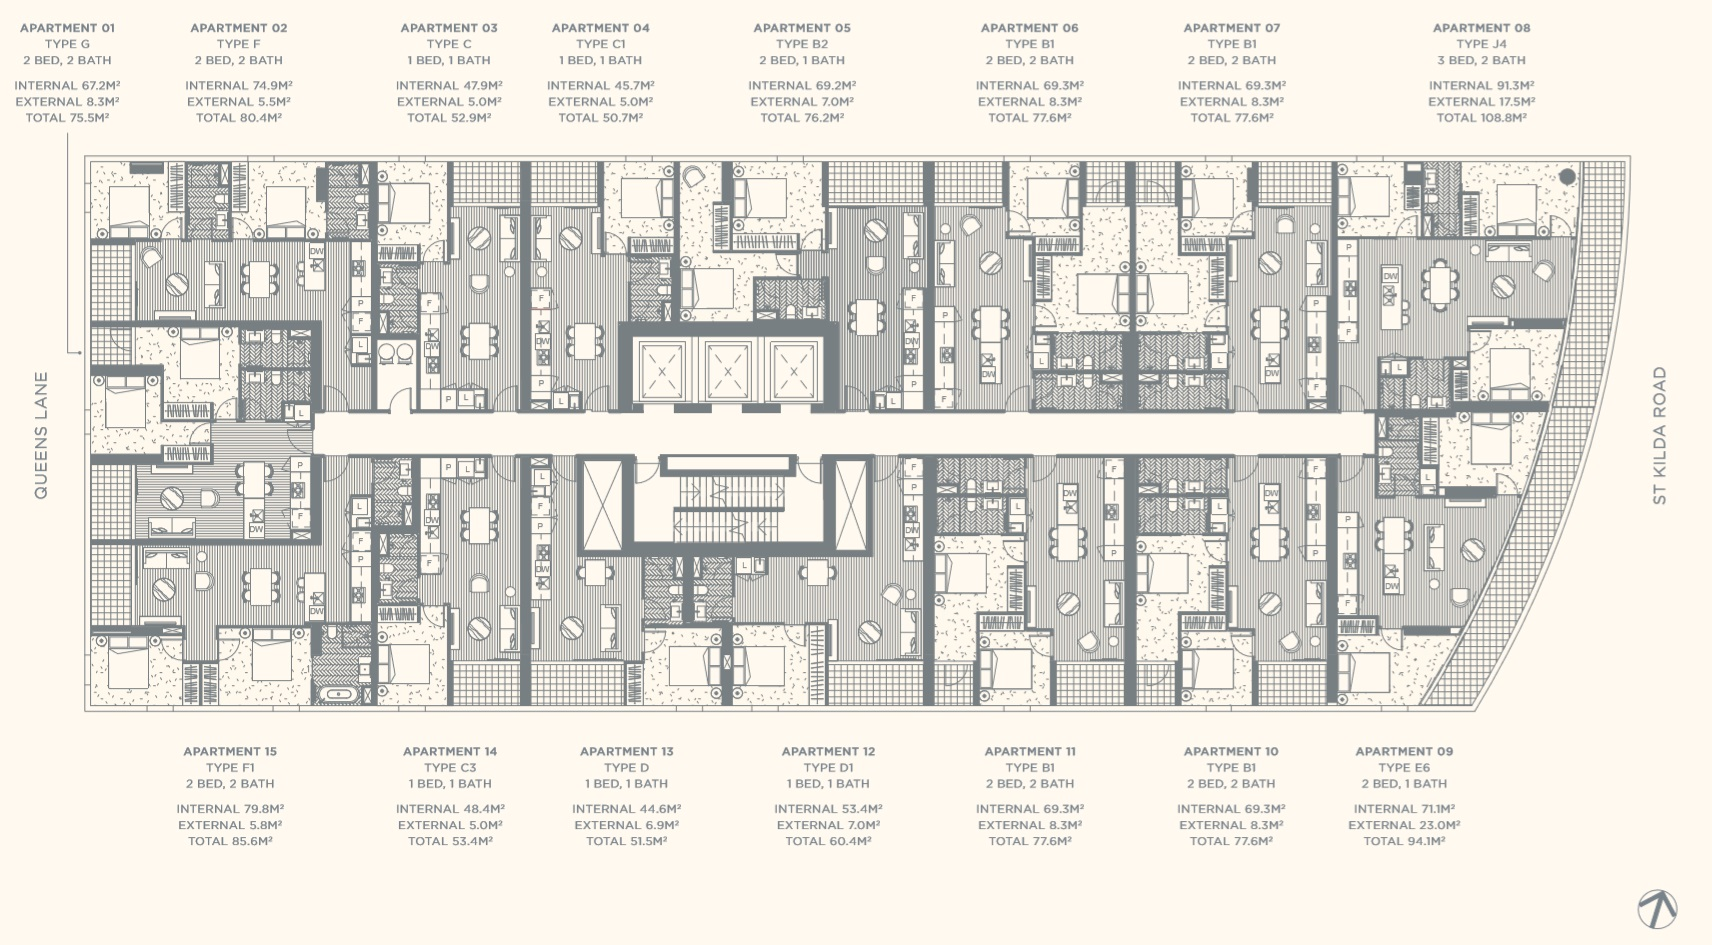 Floor Plate Level 06